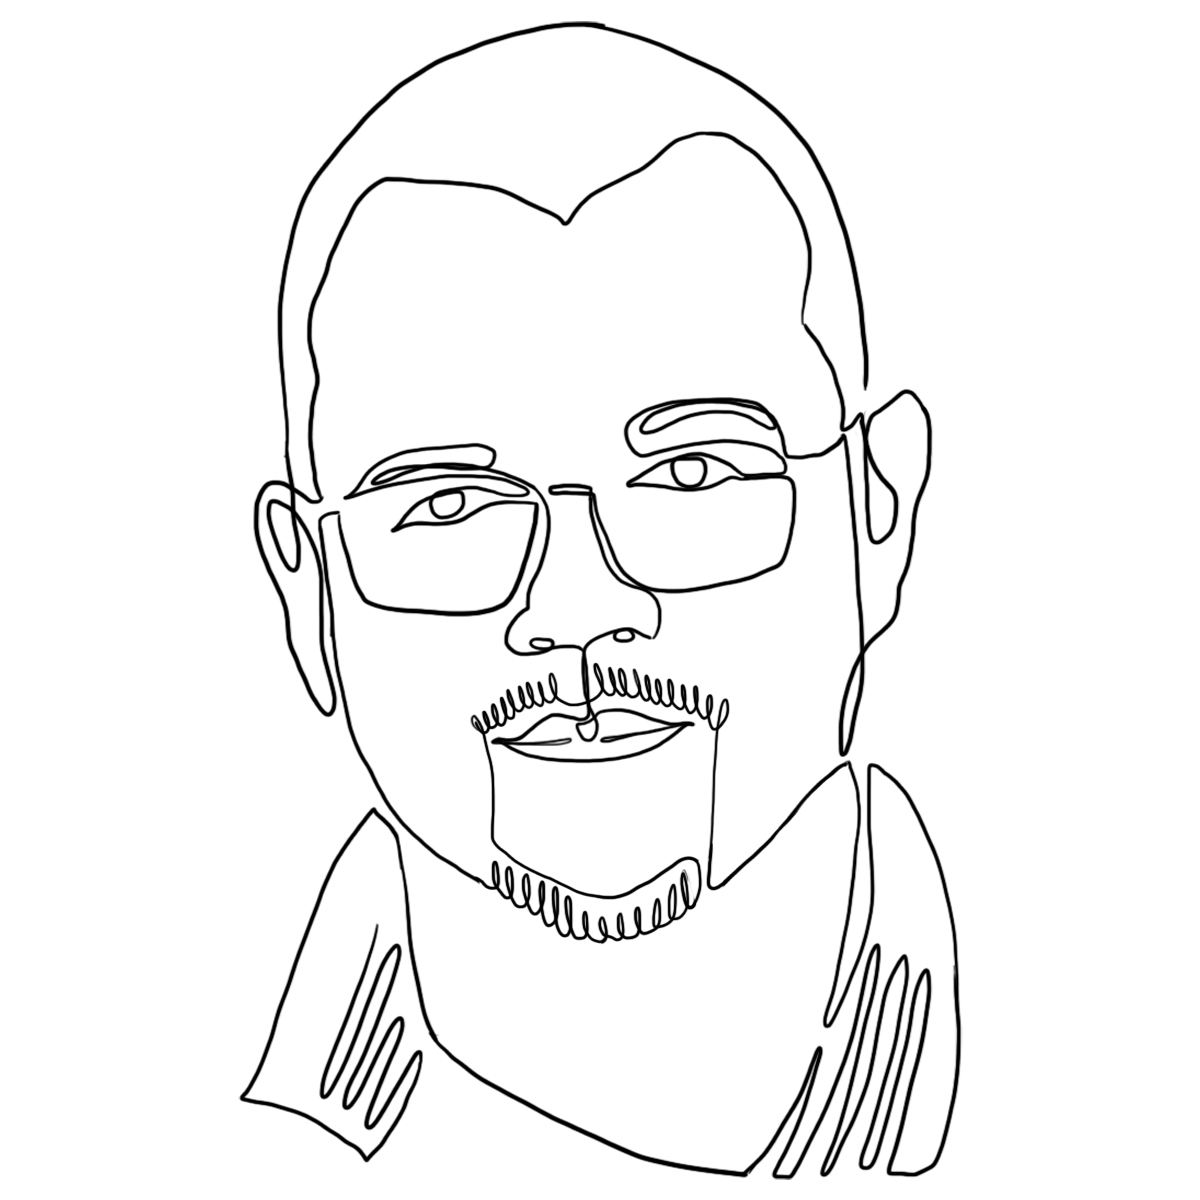 https://conceptum.com.gt/wp-content/uploads/2021/04/Leo-1.jpg